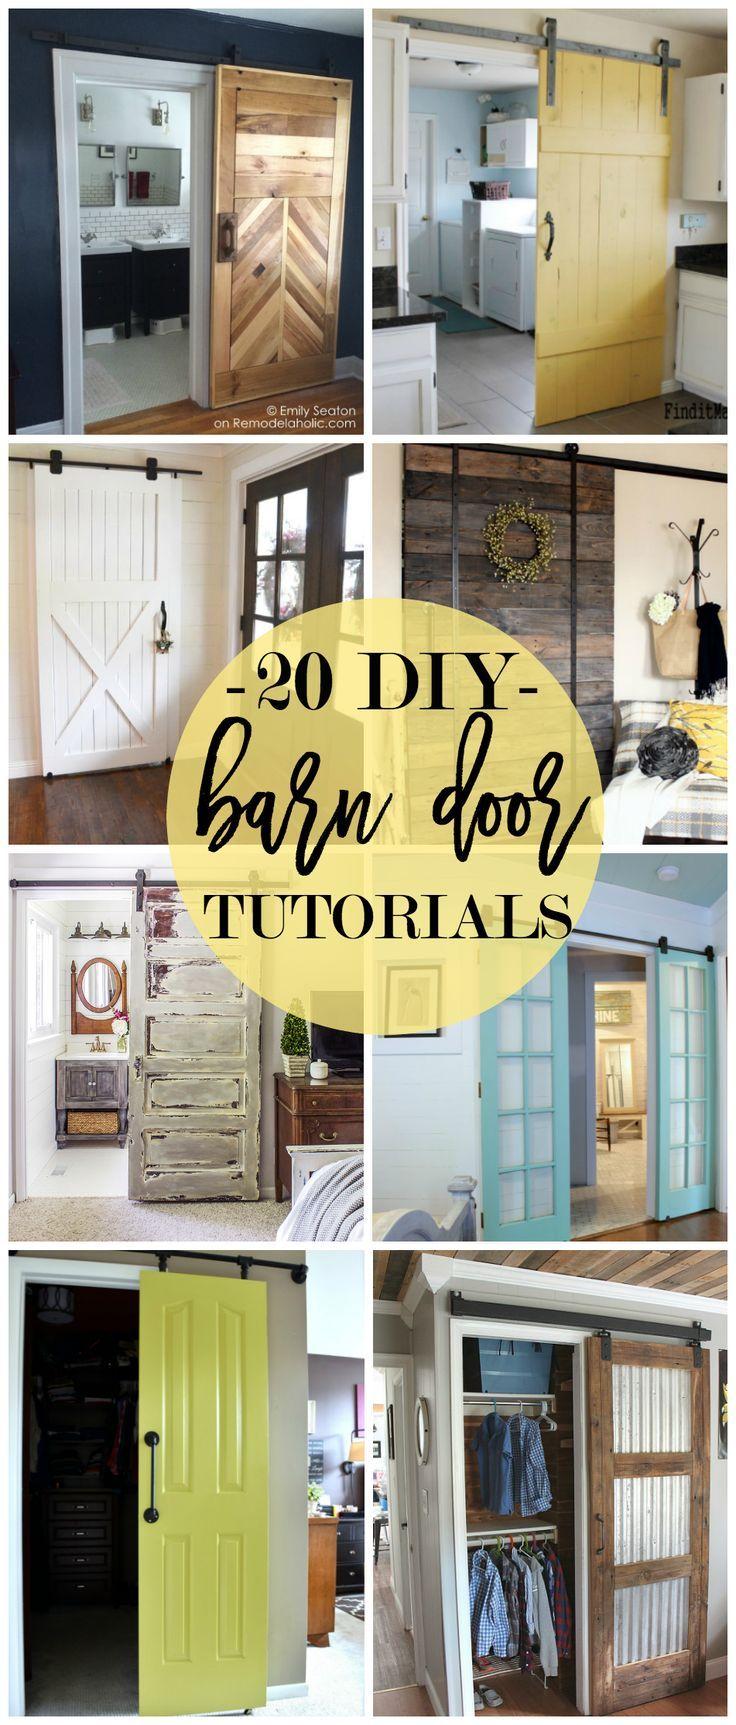 9 things to consider when installing a barn door - 20 Diy Barn Door Tutorials